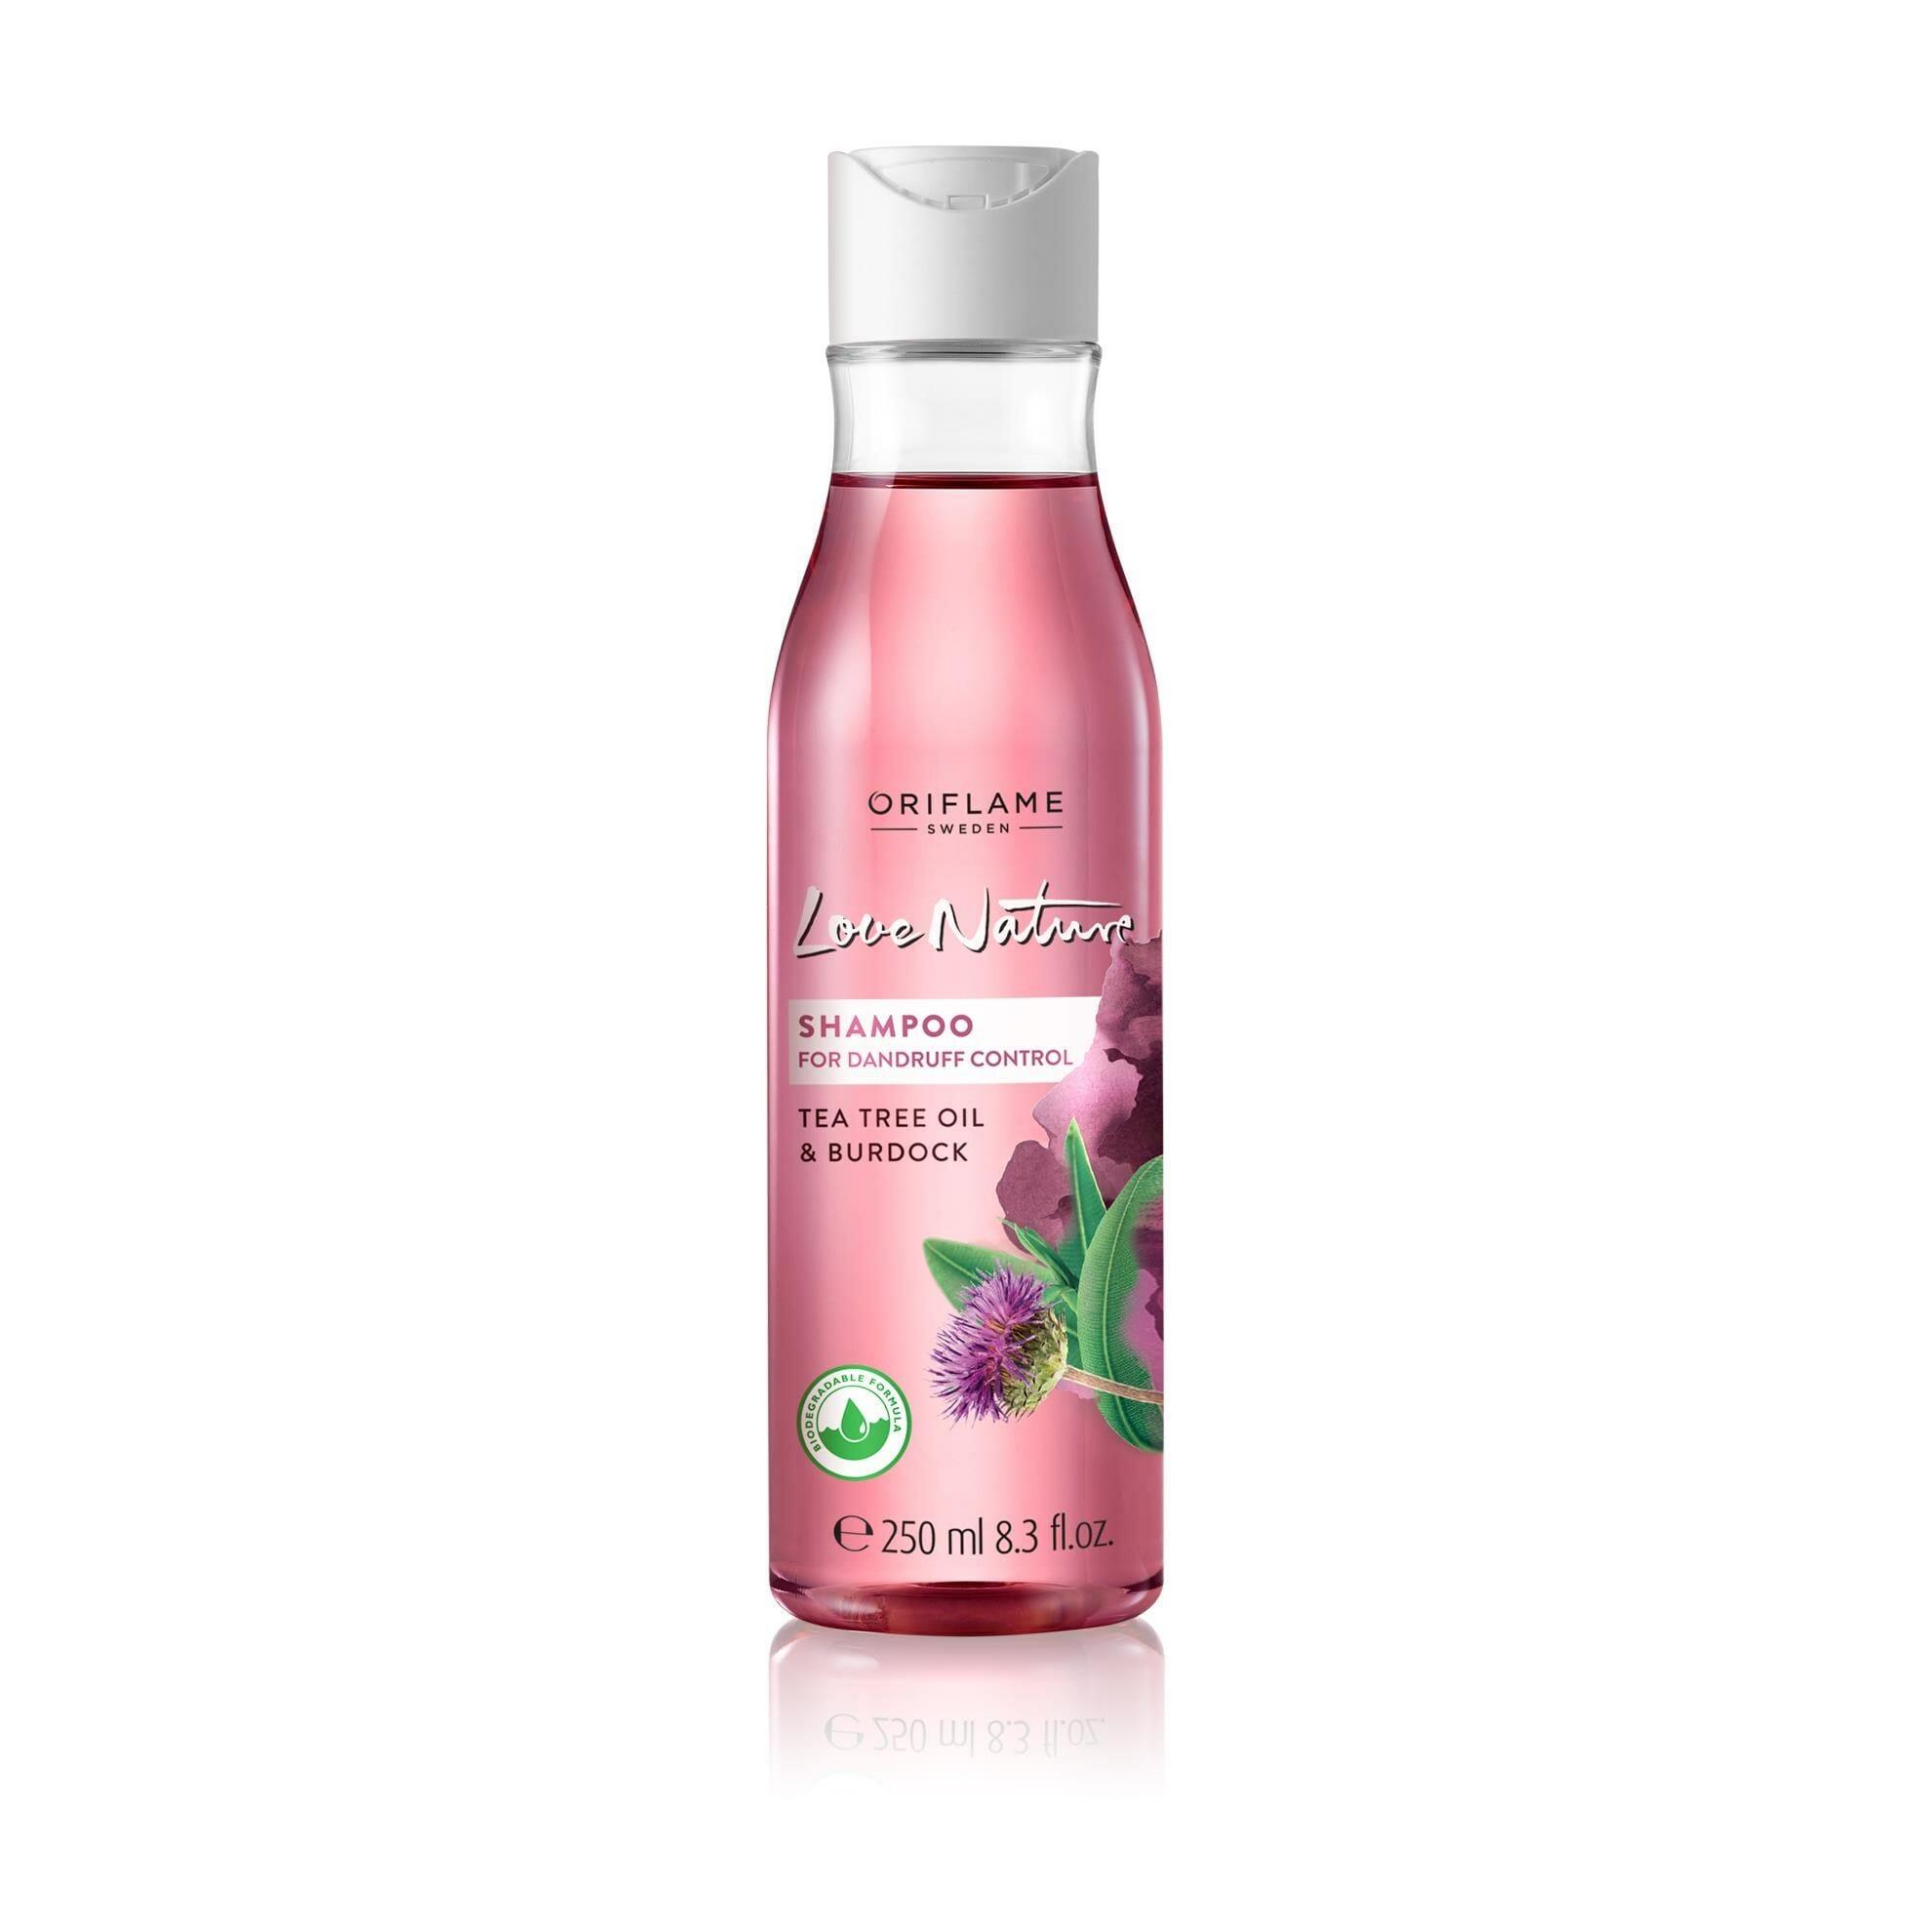 Oriflame Love Nature Shampoo For Dandruff Control Tea Tree Oil & Burdock 250ml Best Shampoo For Dandruff in Pakistan